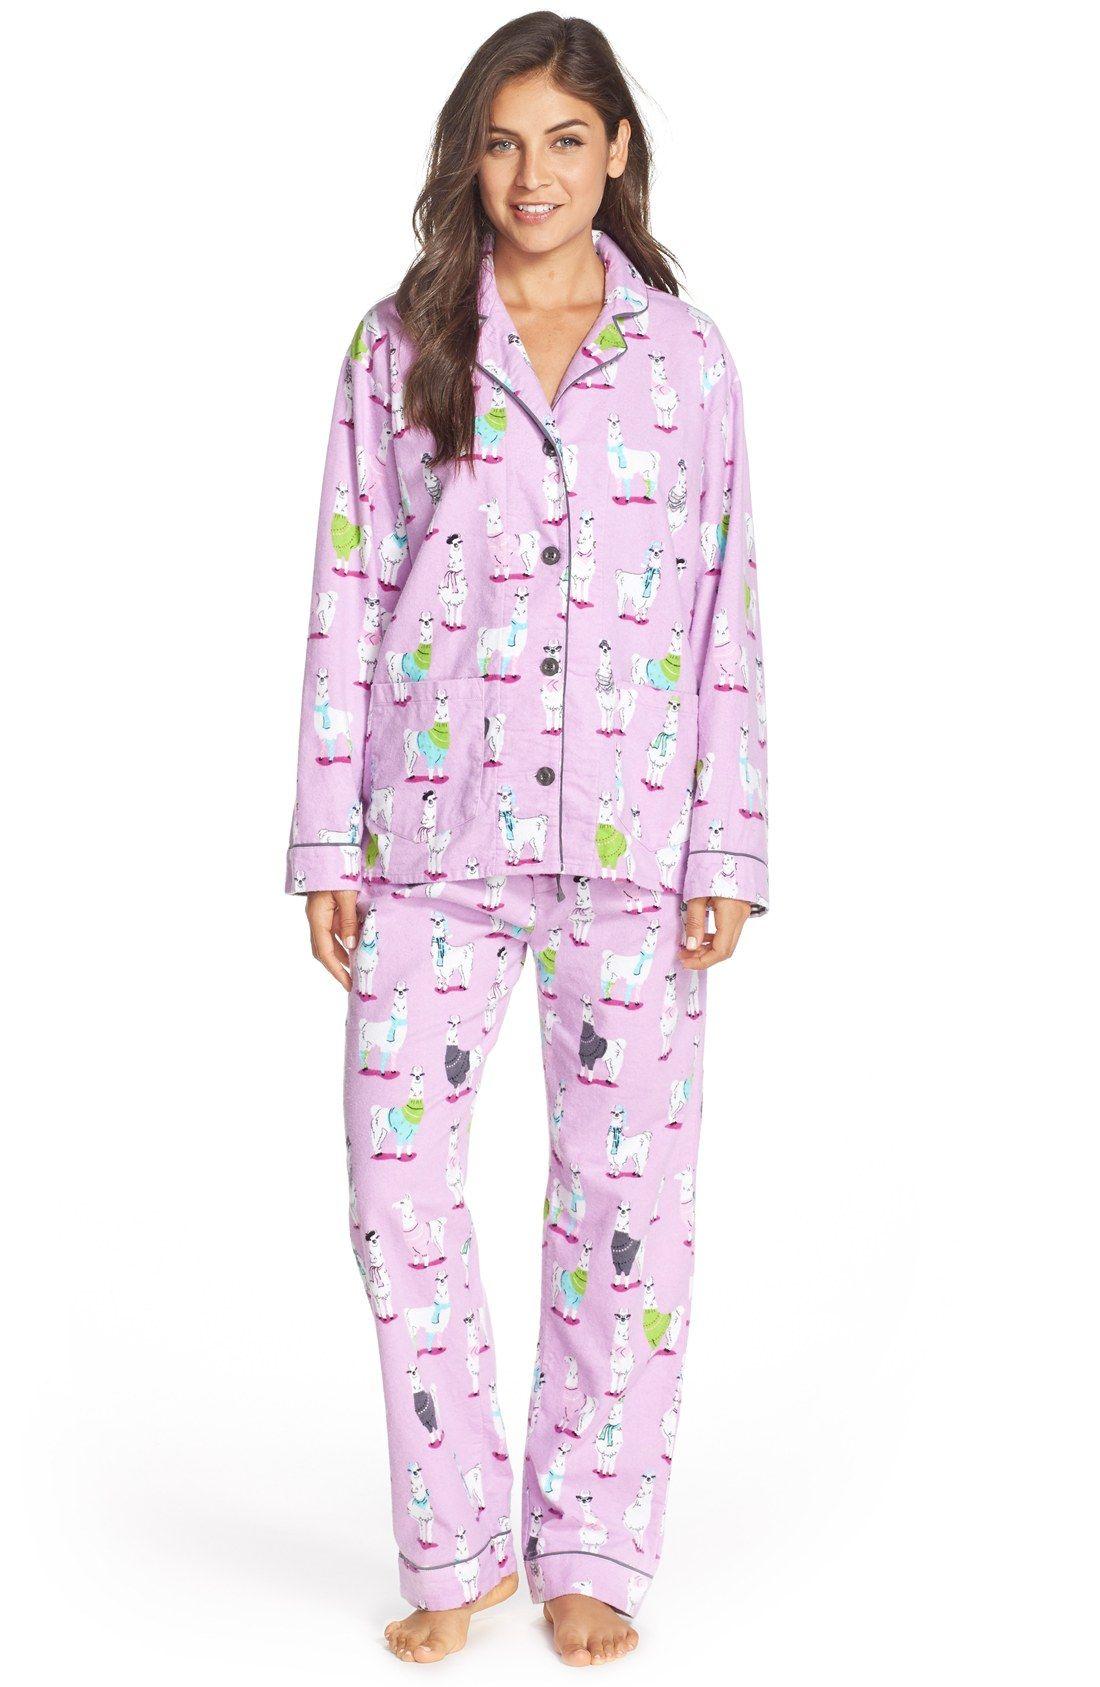 7c3ef51834 Fa-la-la-llama! PJ Salvage Print Flannel Pajamas